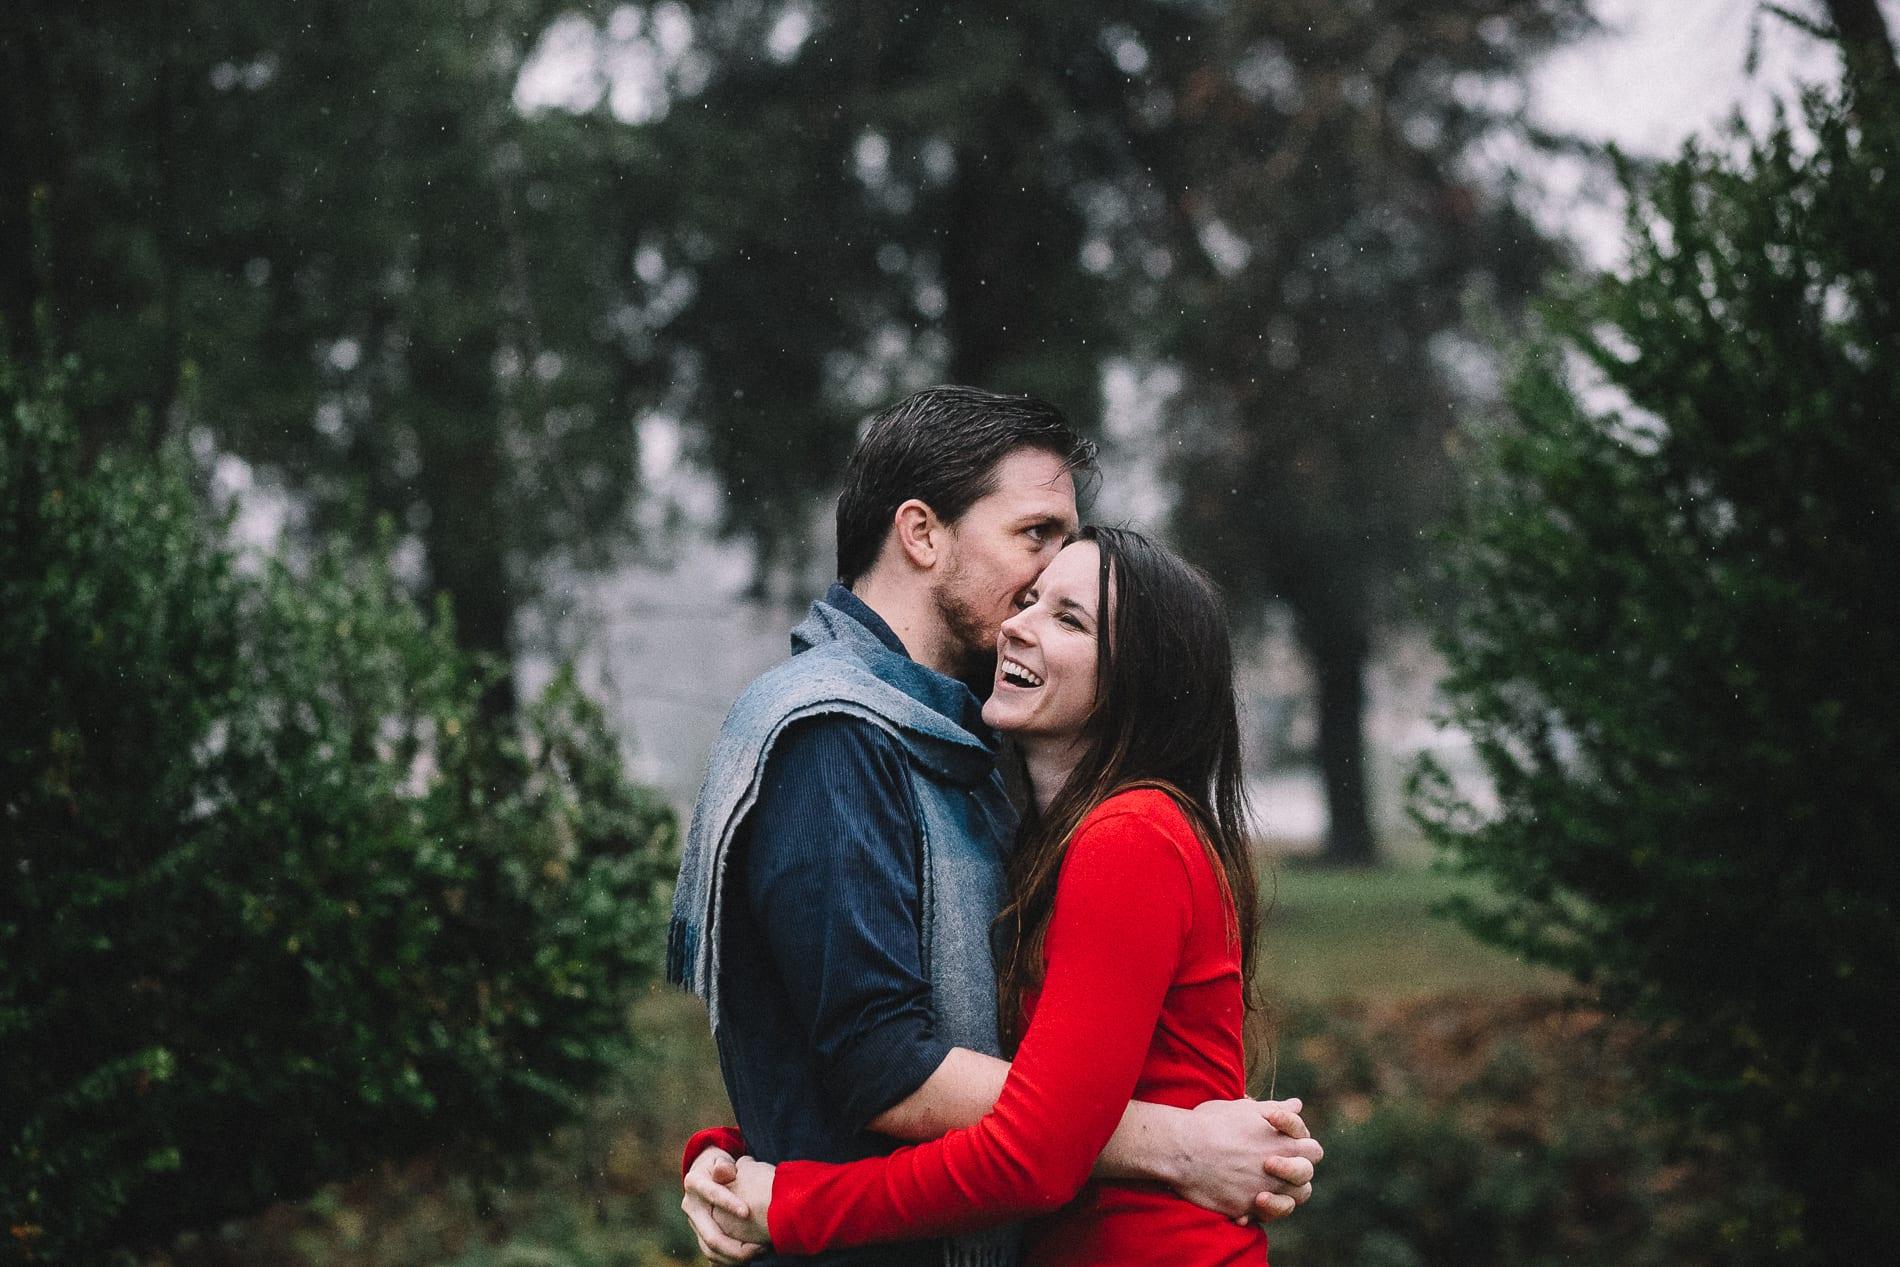 redding-caldwell-lake-park-gazebo-couples-photo-8